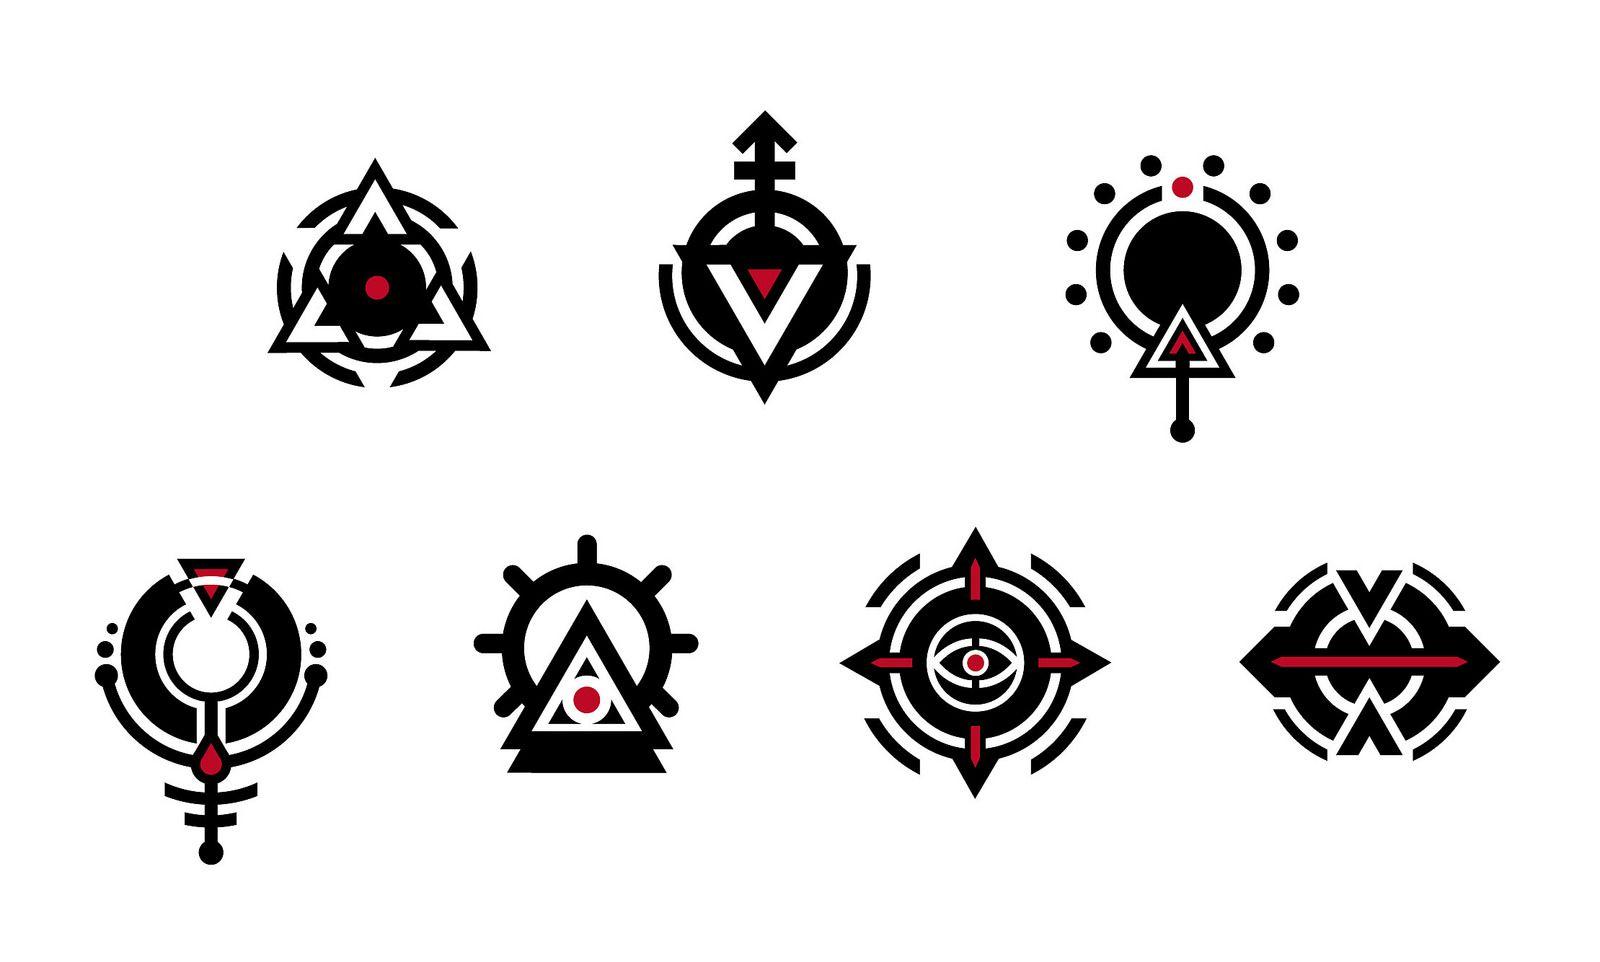 Seven deadly sins symbols google sk tattoos pinterest seven deadly sins symbols google sk tattoos pinterest symbols google and tattoo biocorpaavc Choice Image